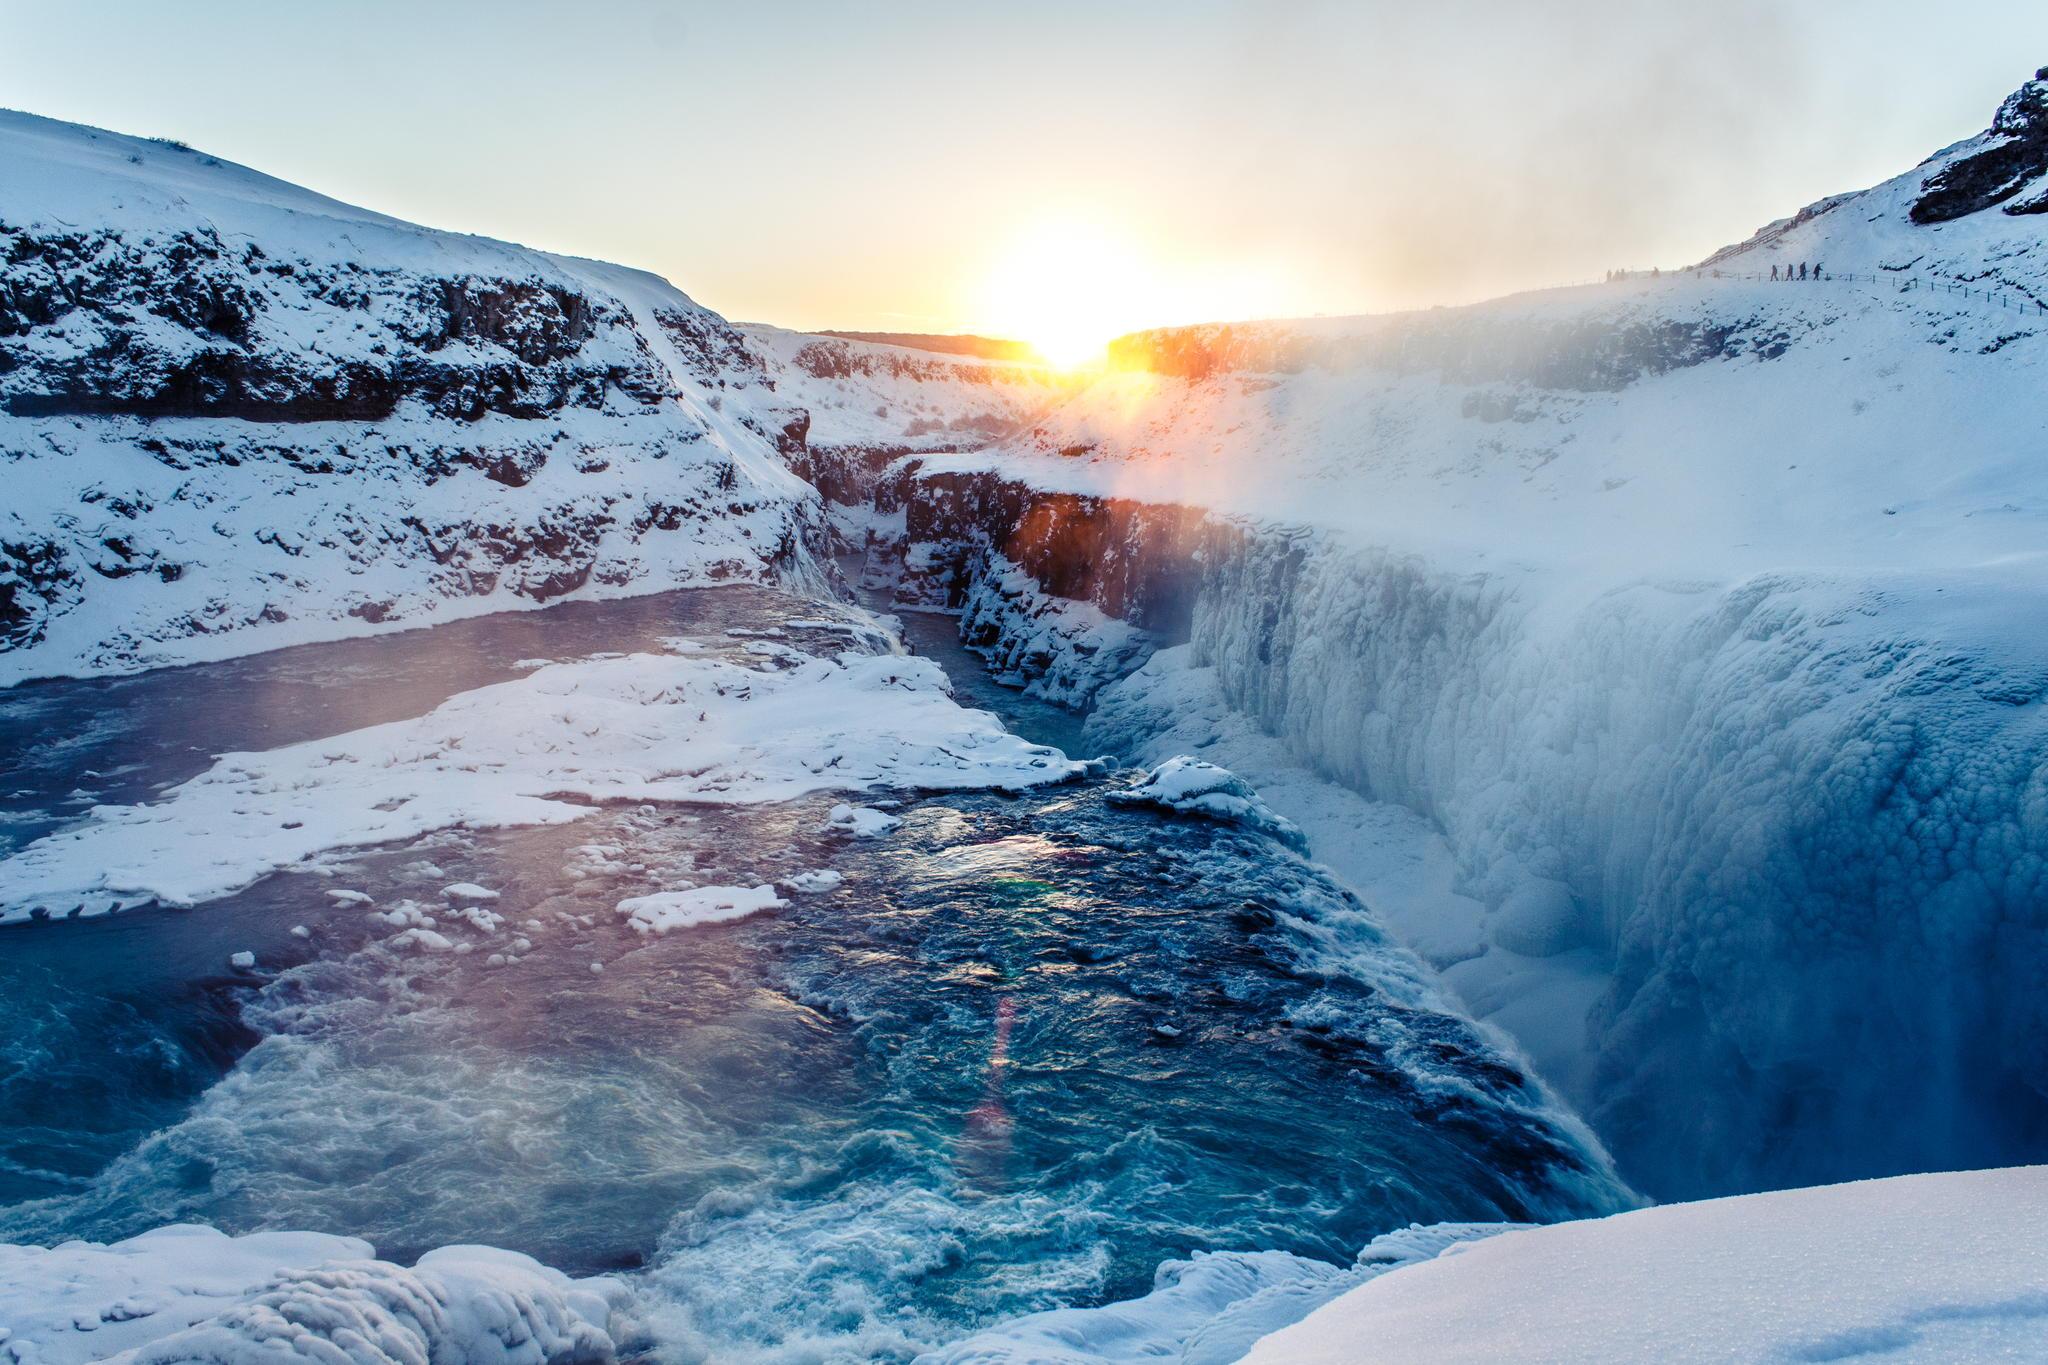 66362 скачать обои Природа, Водопад, Лед, Снег - заставки и картинки бесплатно